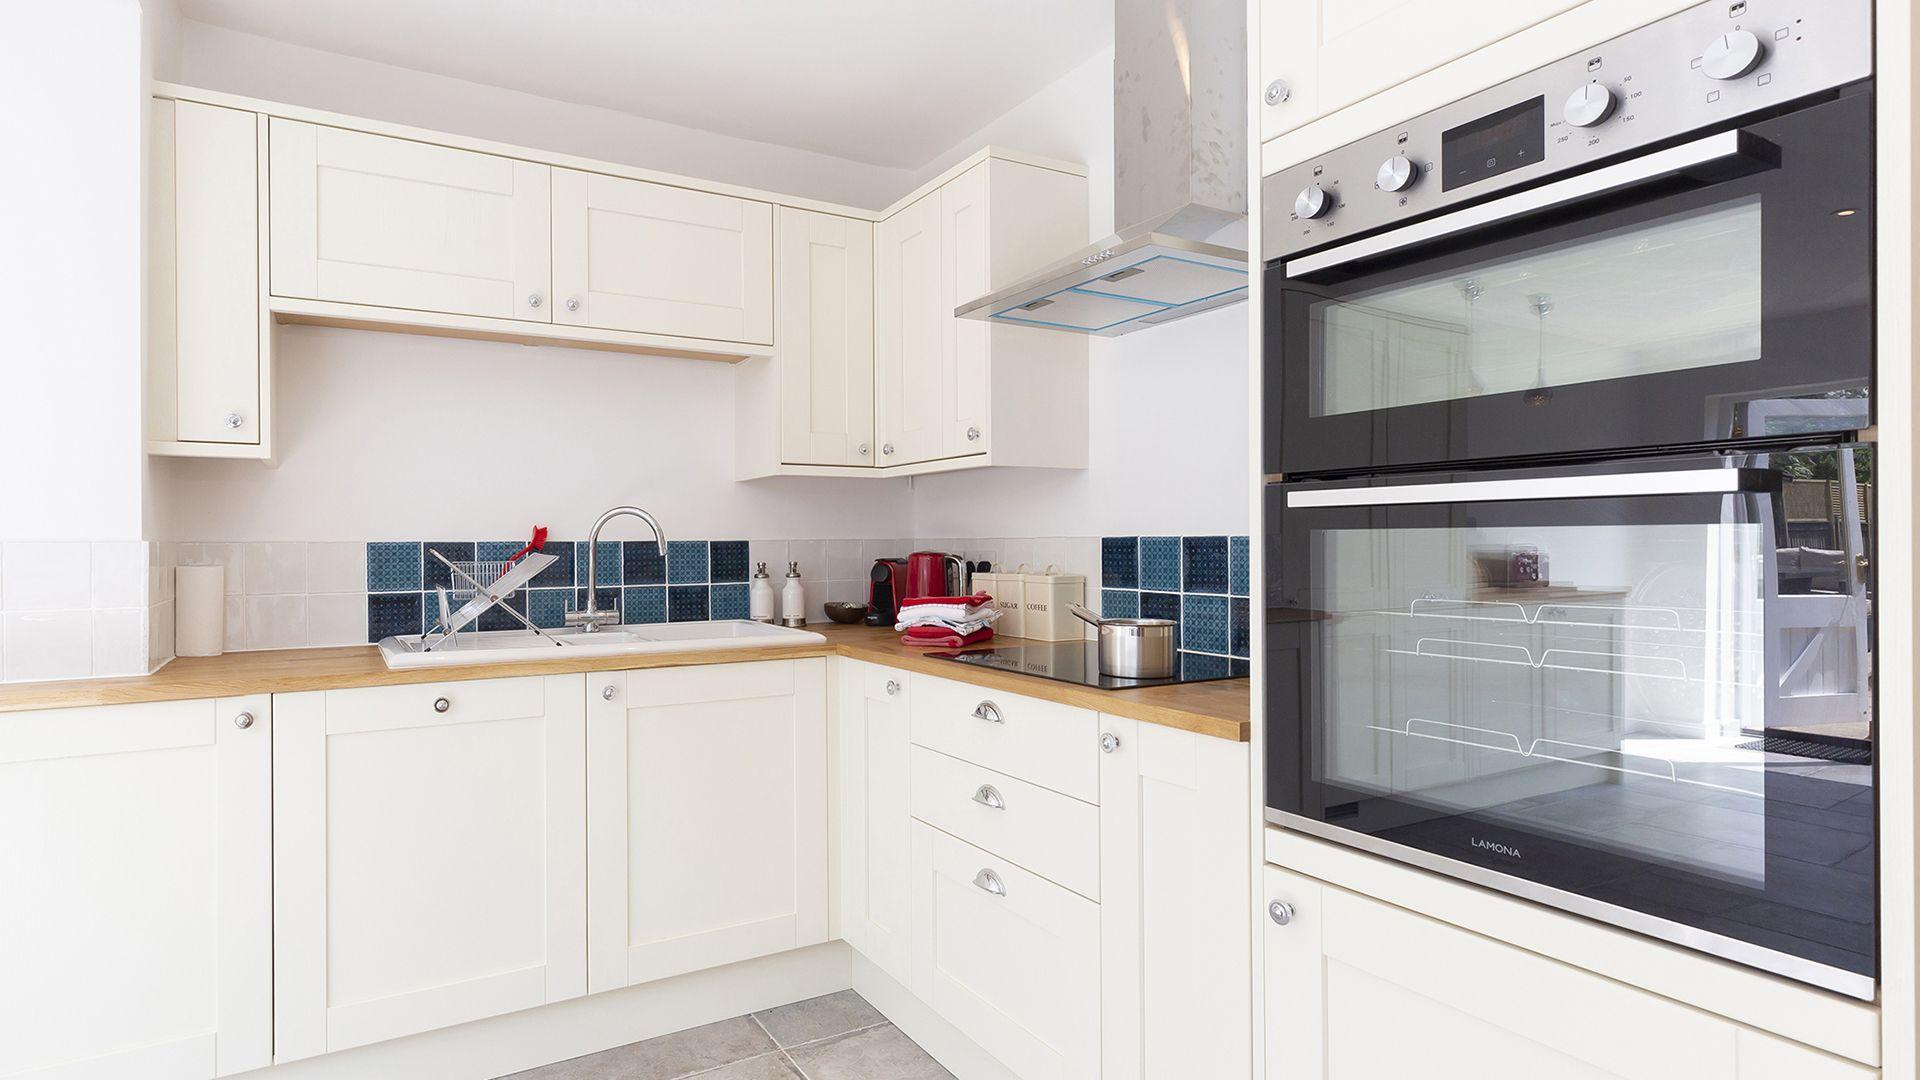 Kitchen, South Winds, Bolthole Retreats